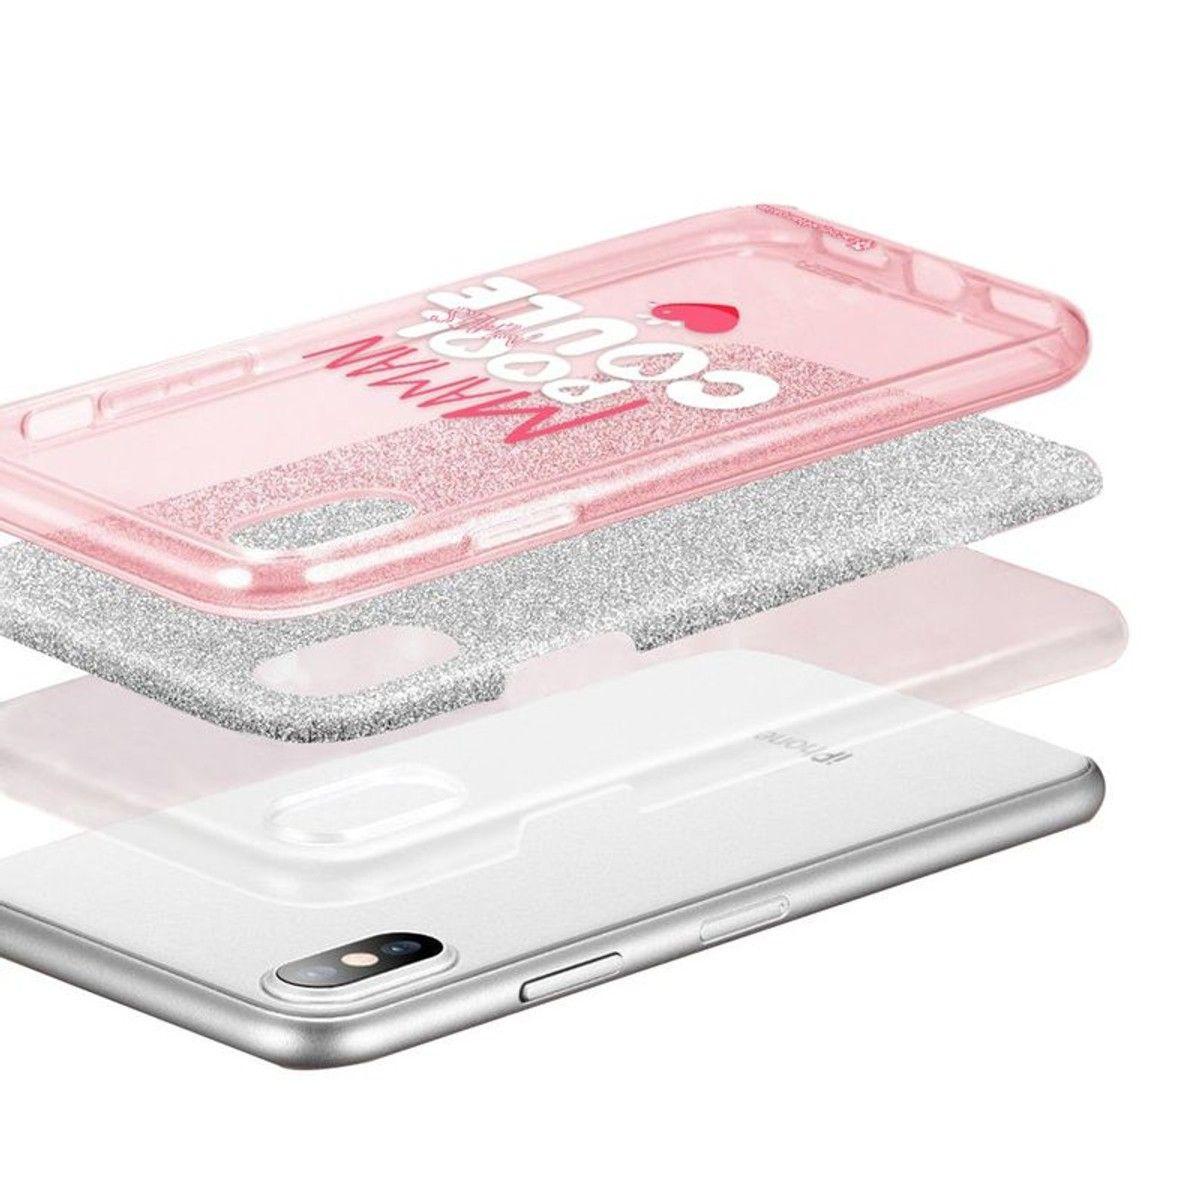 coque iphone xs rose paillette